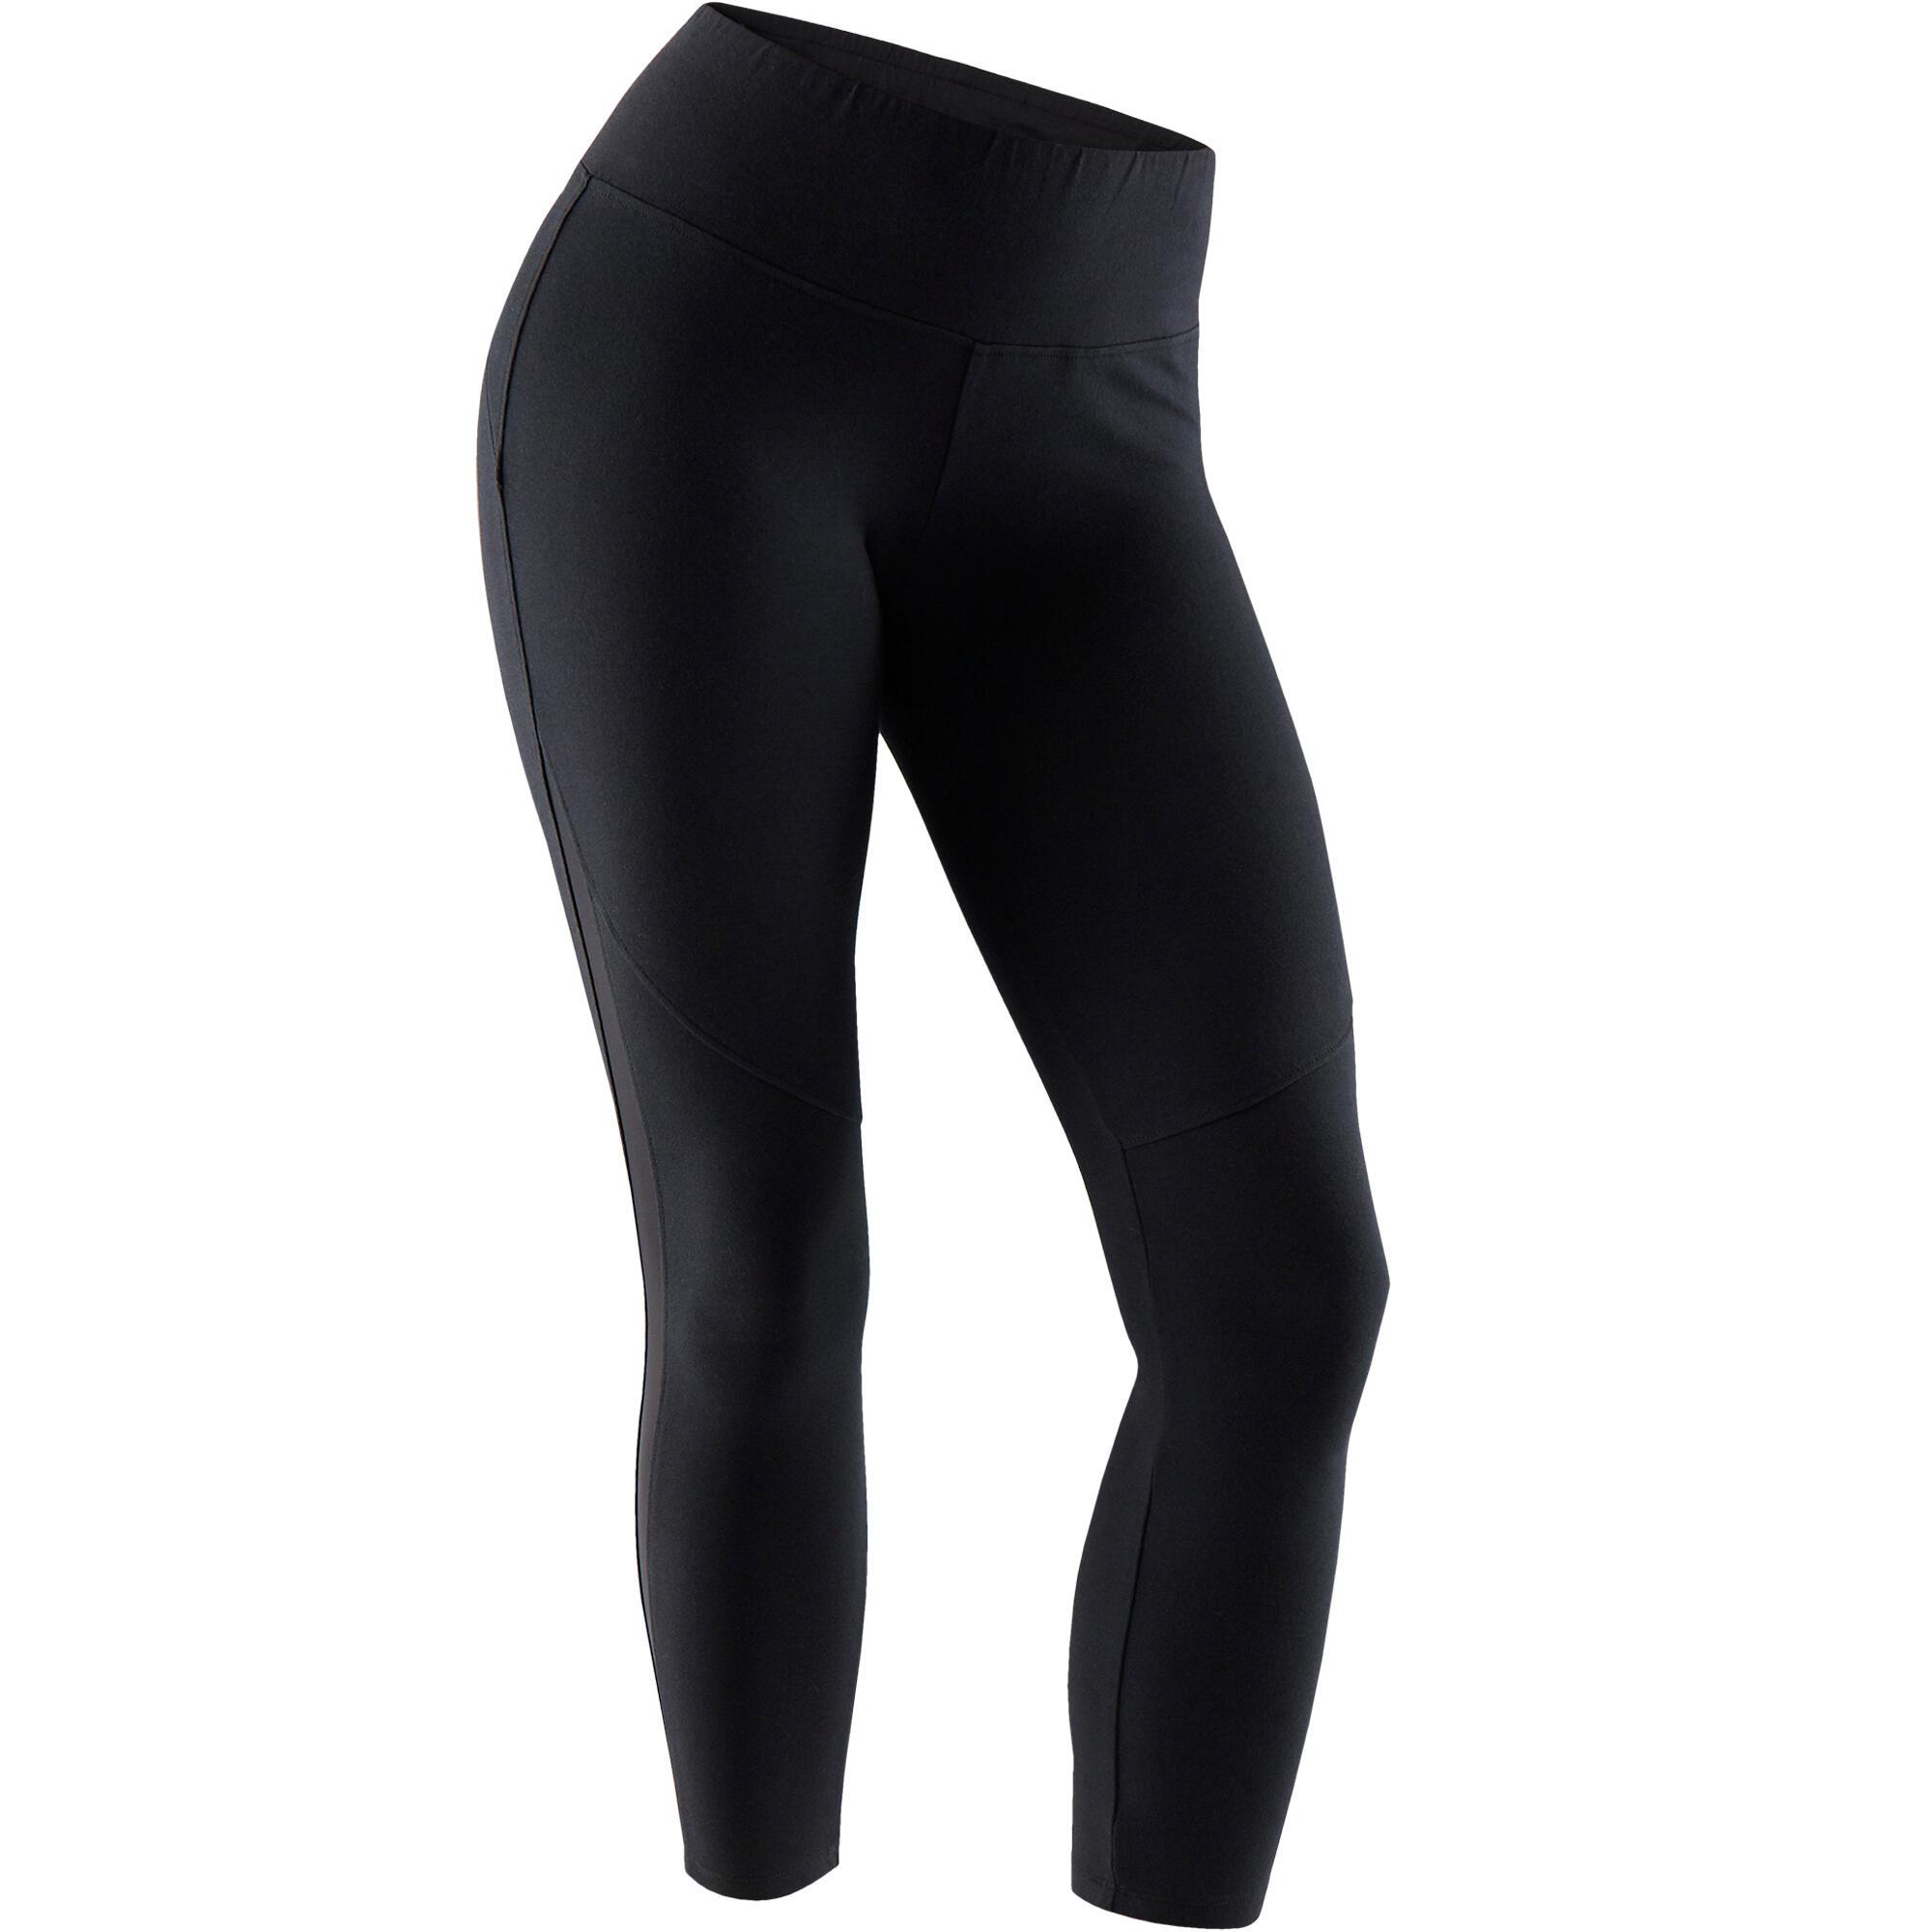 Douce 78 Gym Noir 520 Pilates Legging Femme NOyvw8nP0m